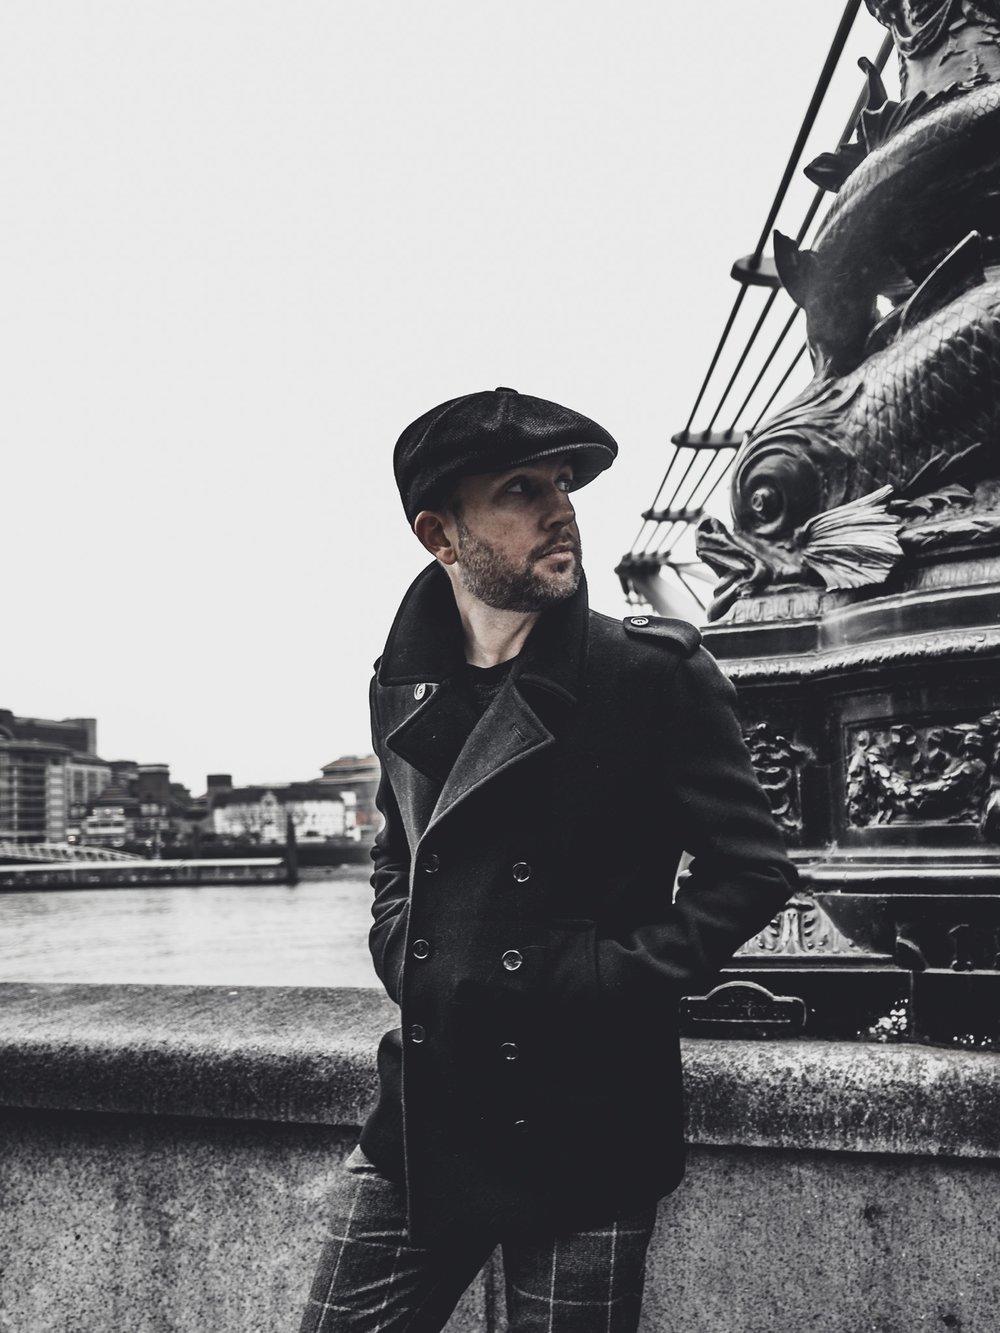 Jay McLaughlin OOTD Outfit Peacoat London Newsboy Cap